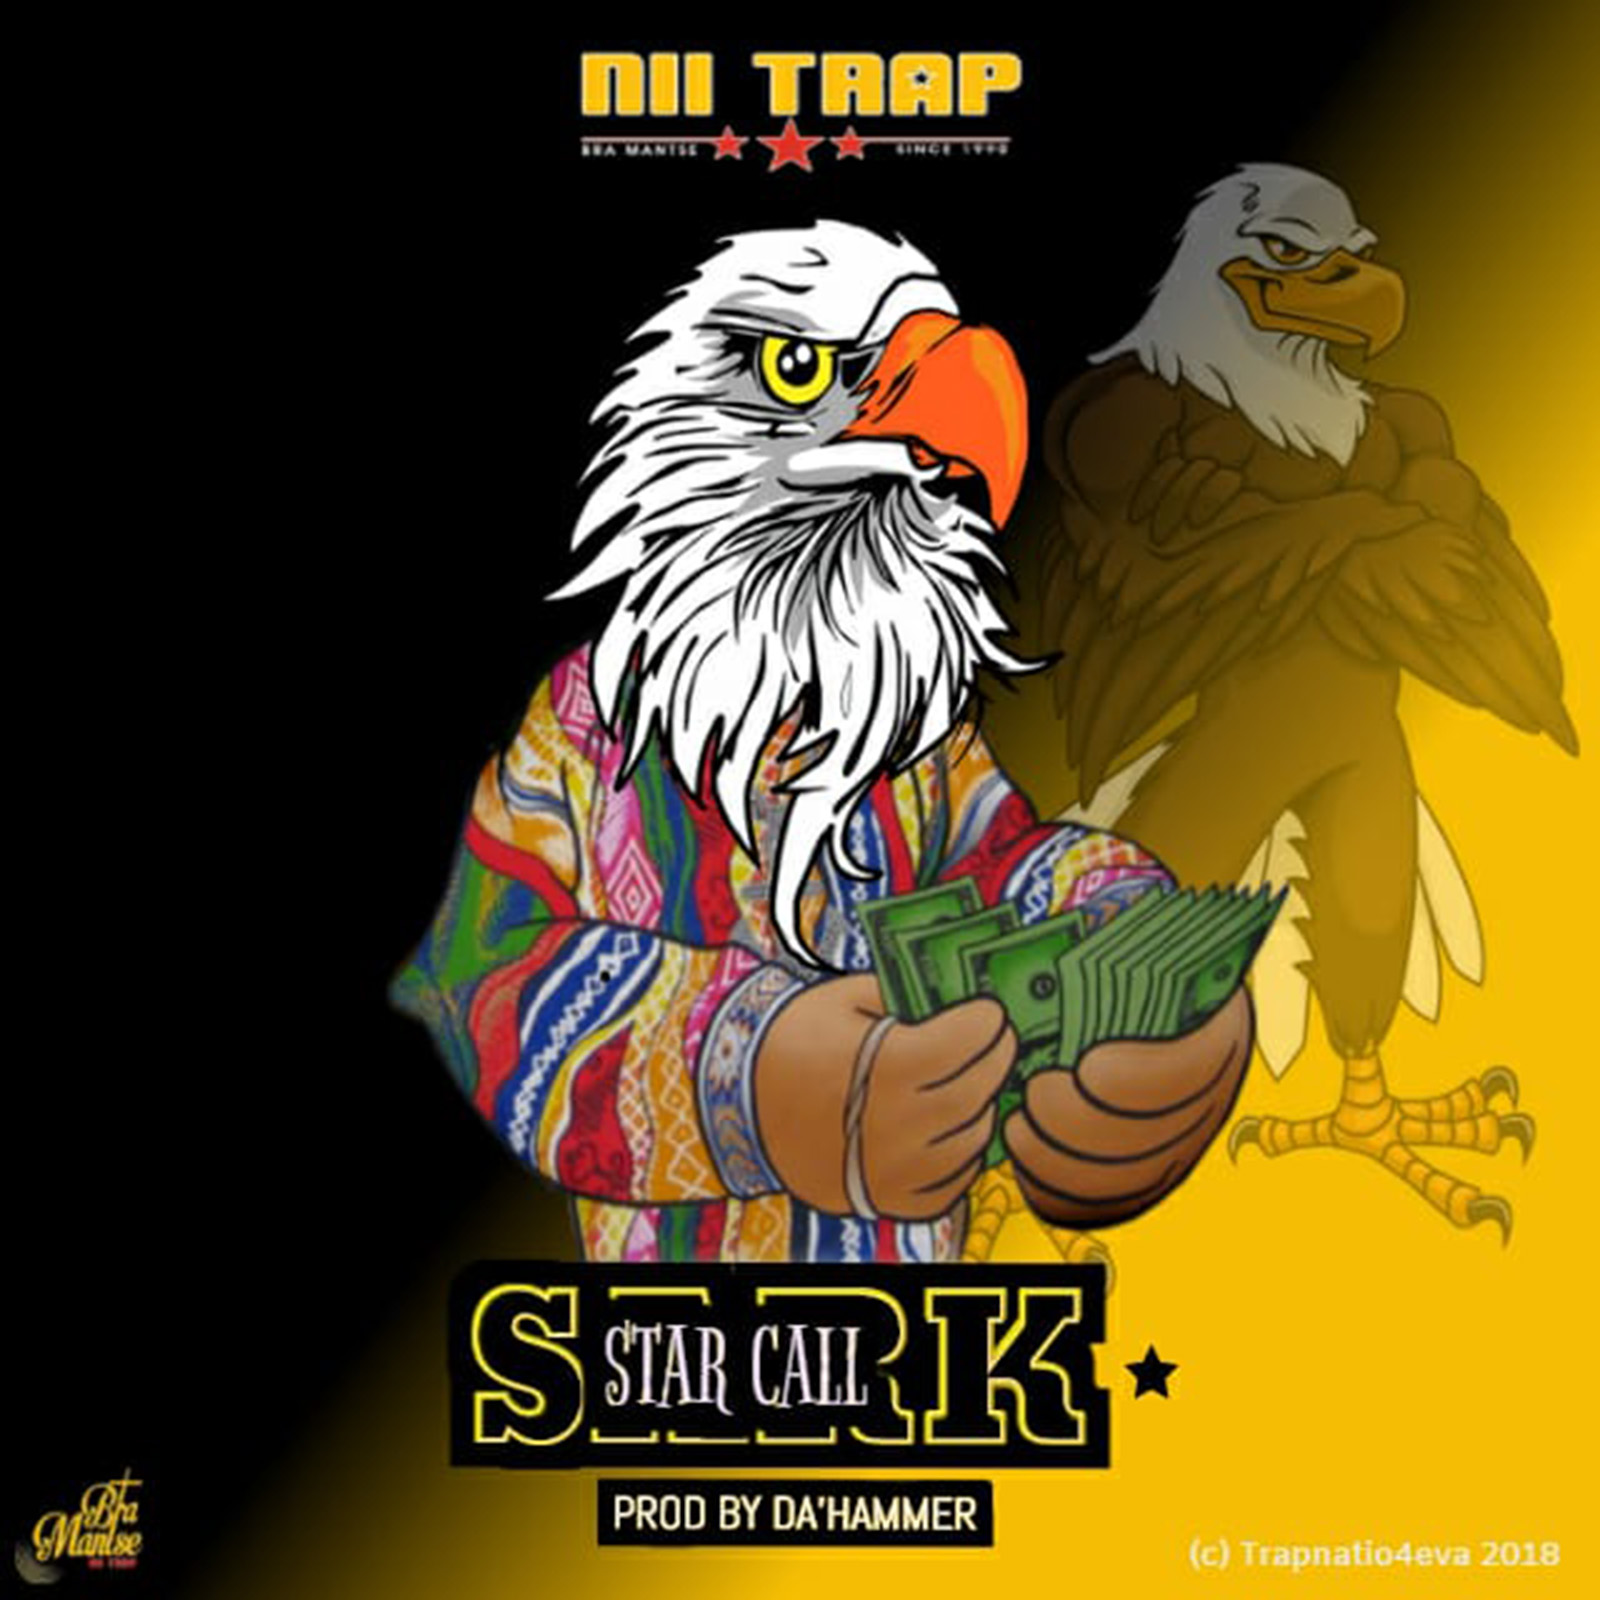 Star Call by Nii Trap